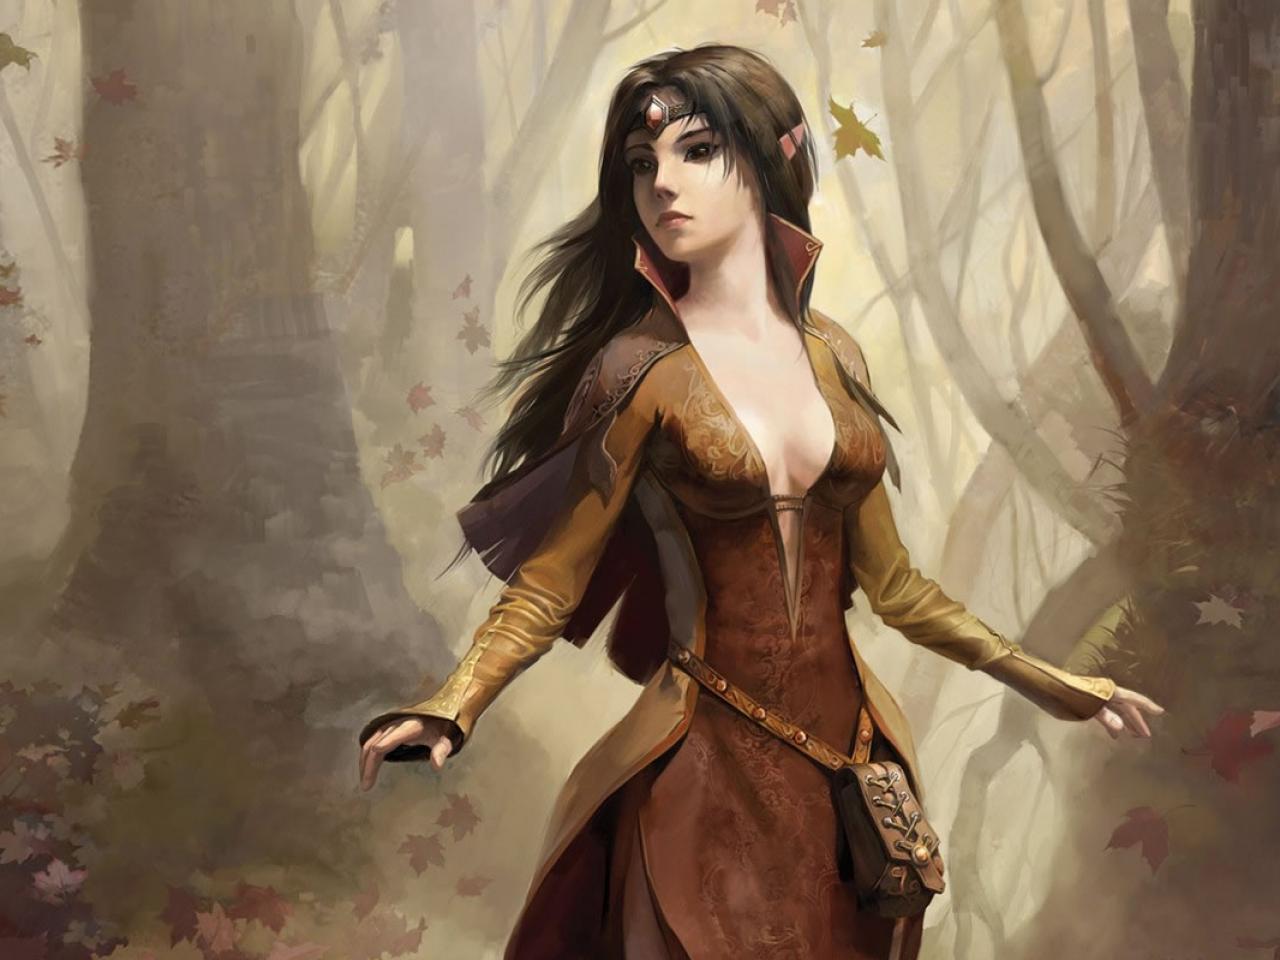 wallpaper forest elf girl wallpaper elf fantasy girl desktop 1280x960